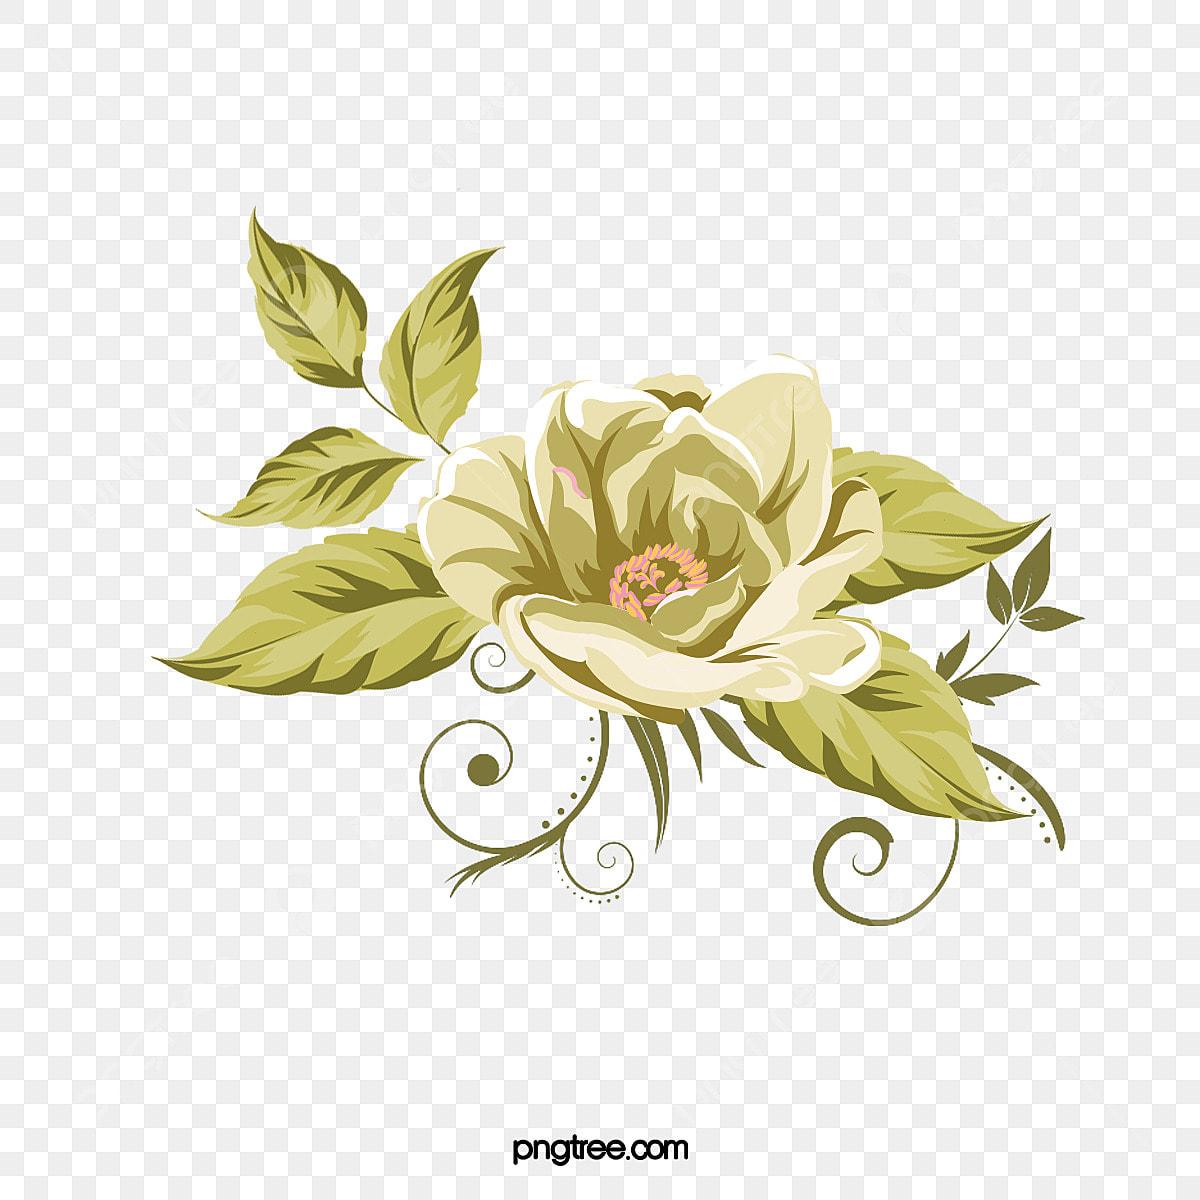 Ilustracao De Flor Delicada Dos Desenhos Animados Cartoon A